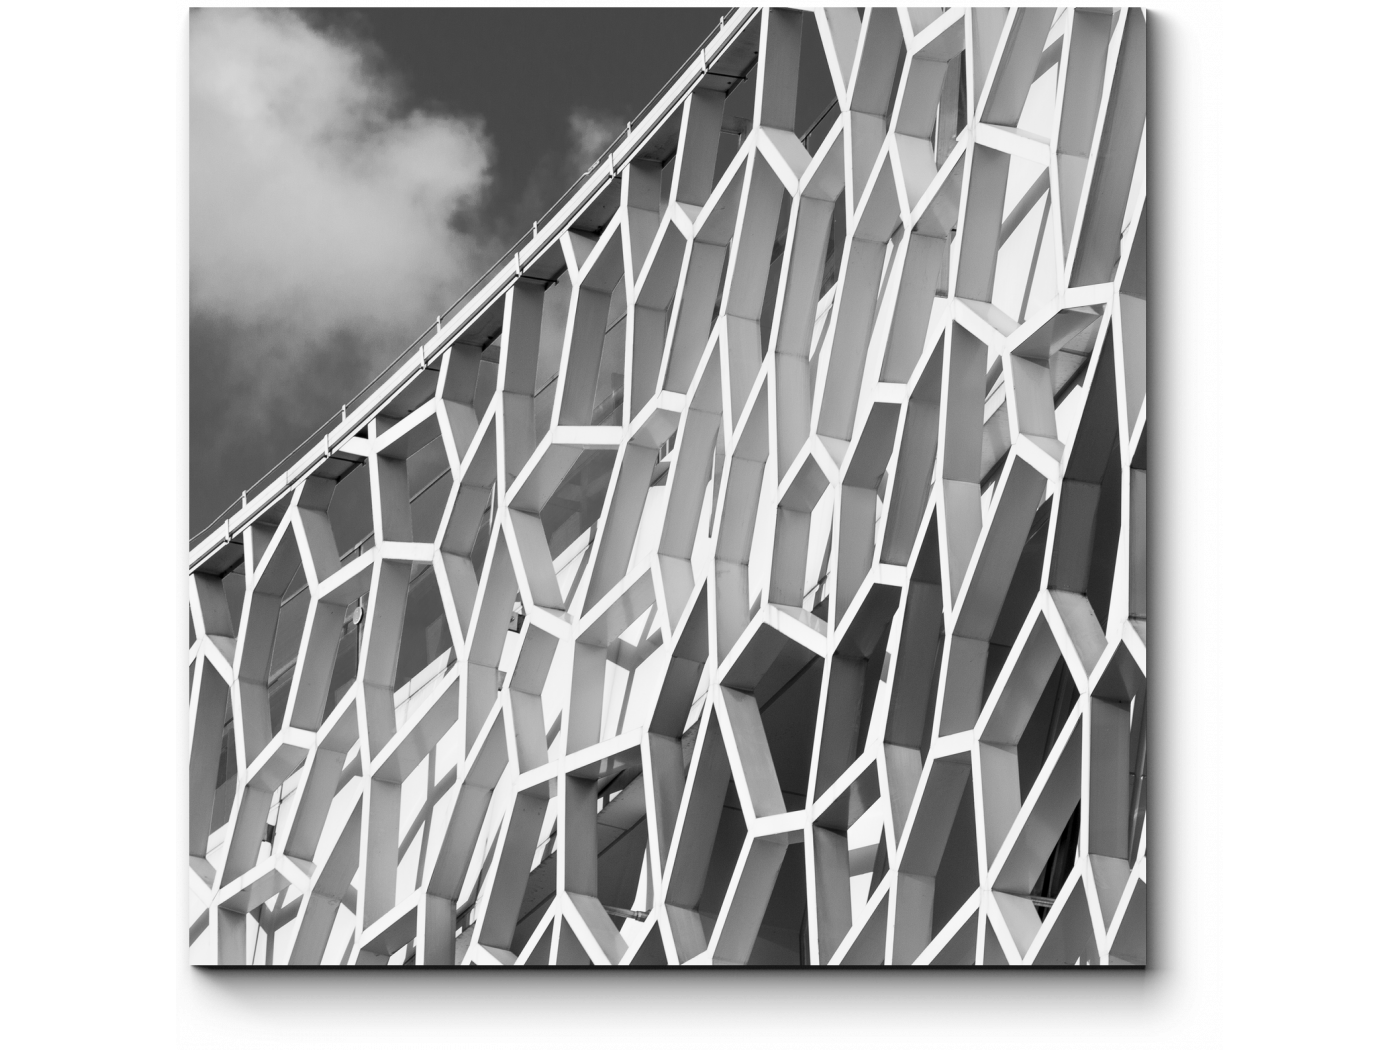 Модульная картина Архитектурная фантазия (20x20) фото